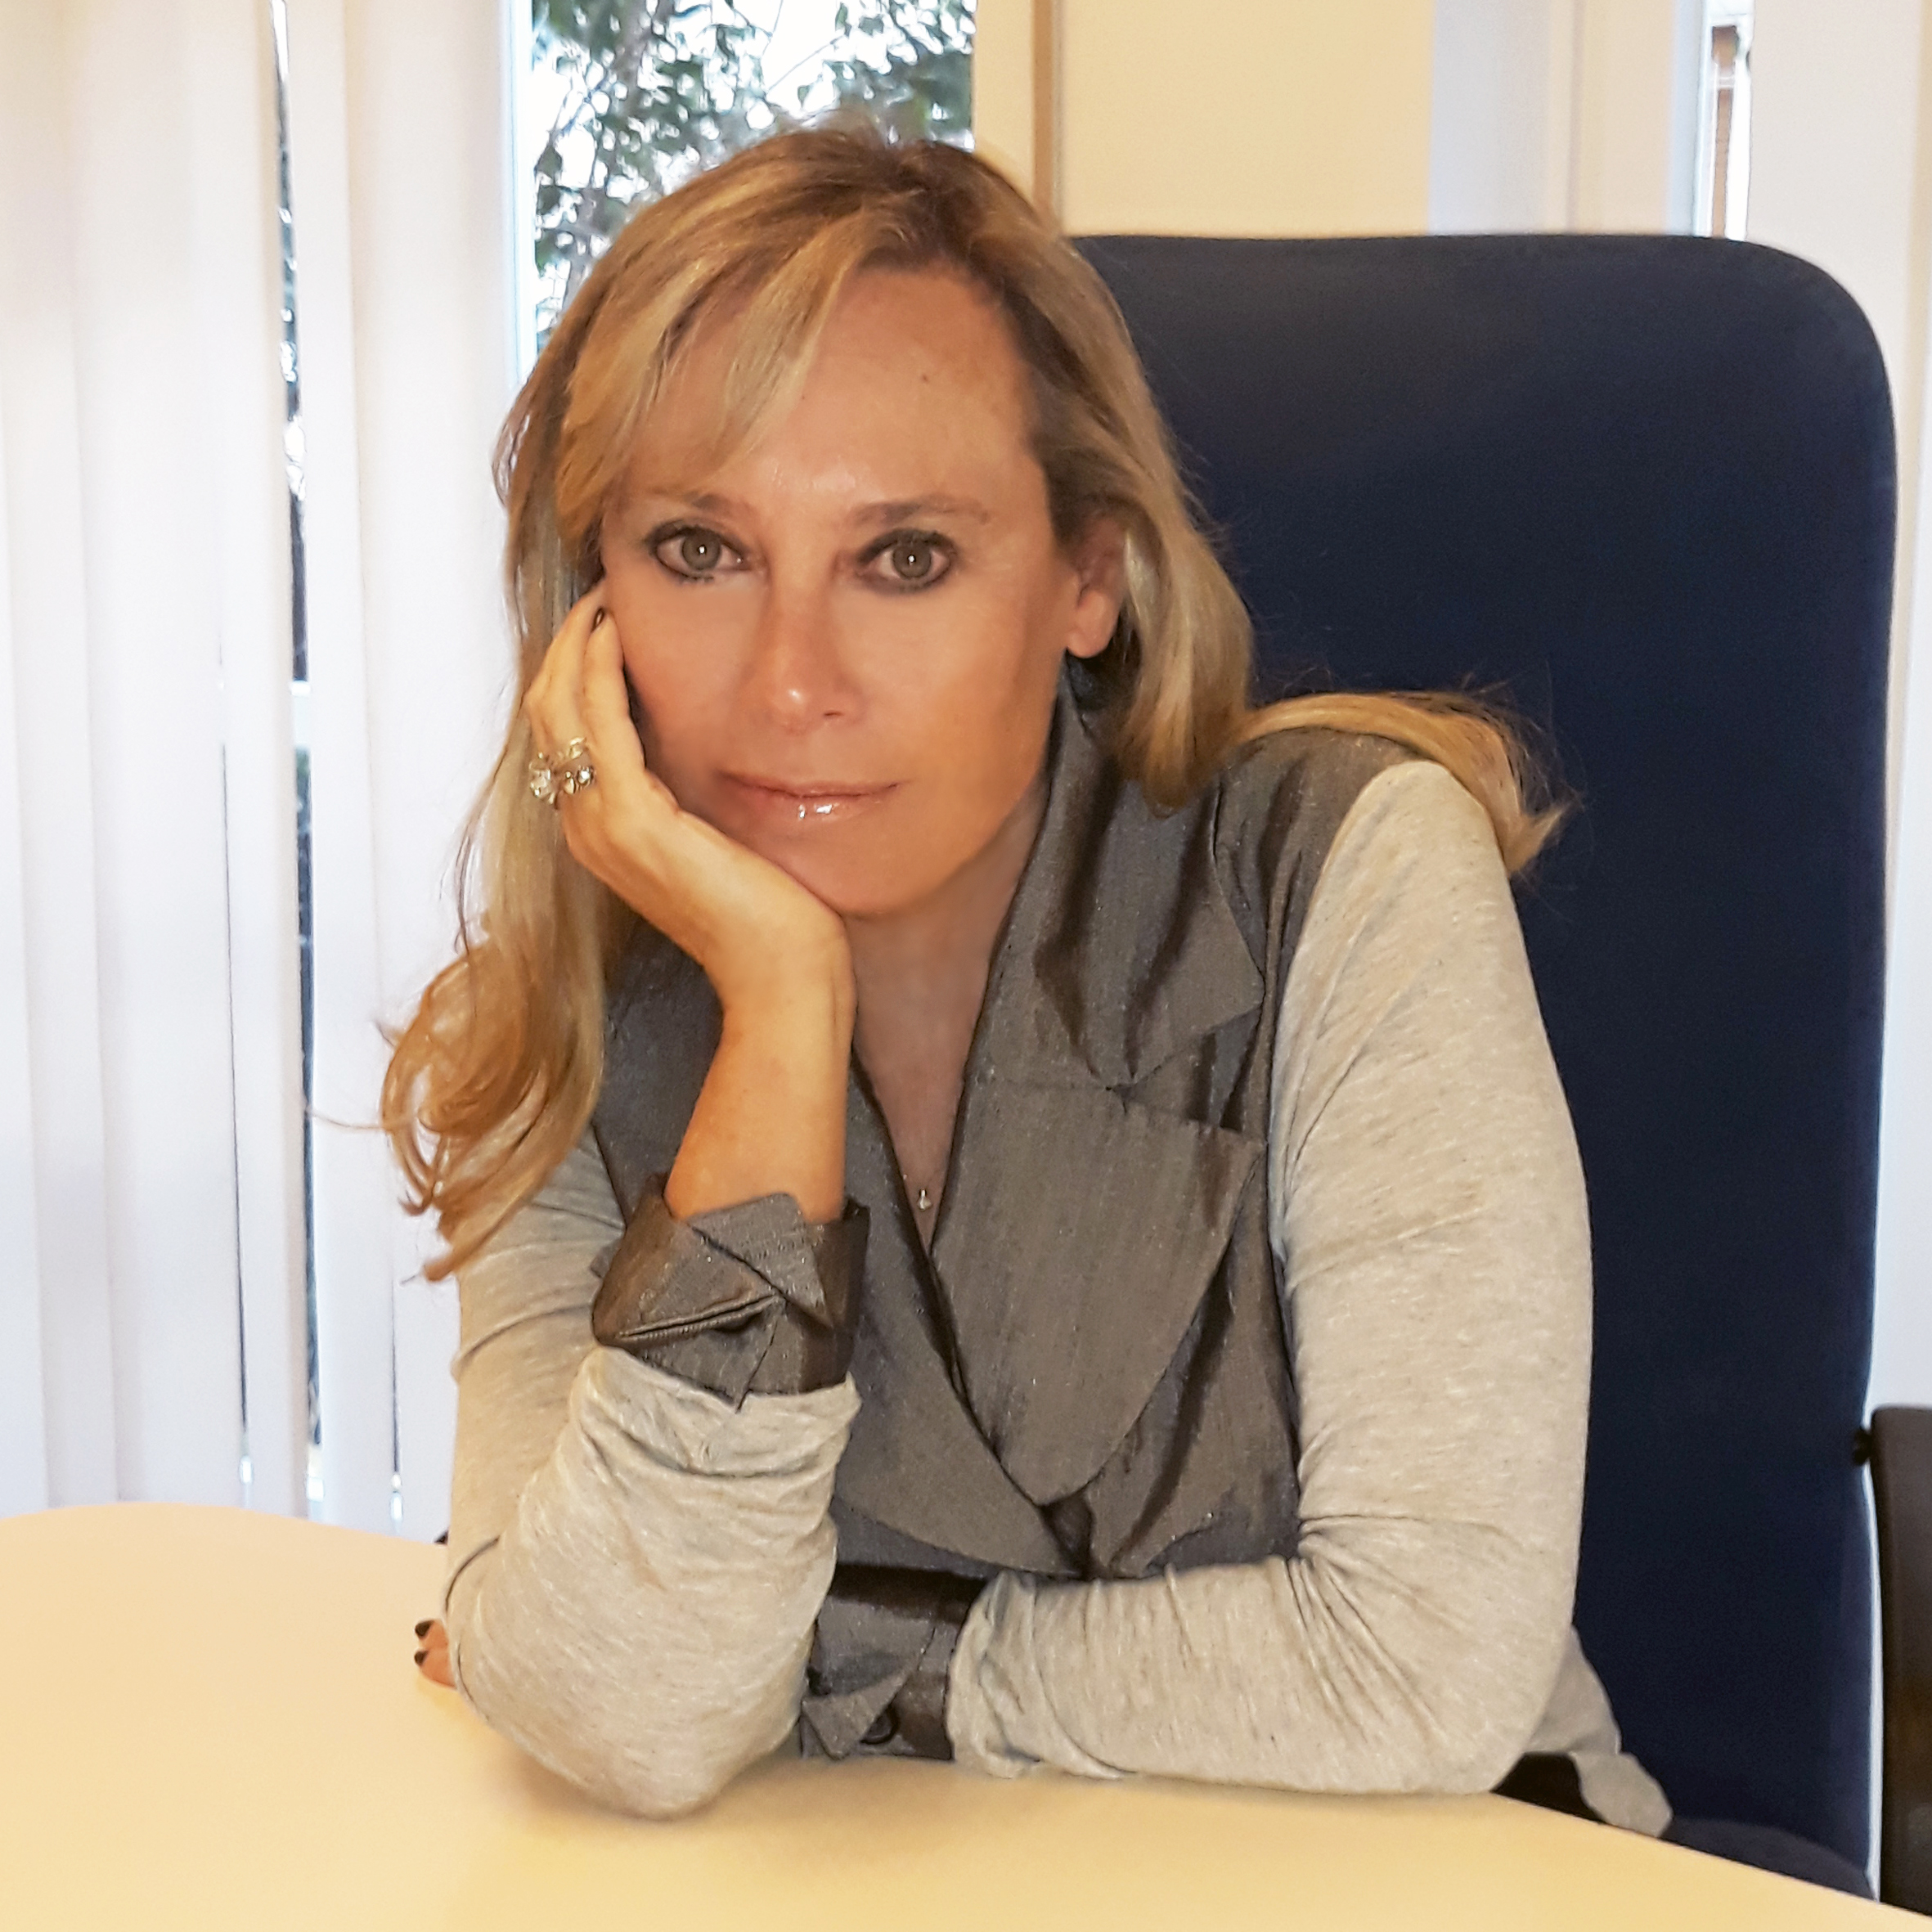 Dott.ssa Milvia Verginelli